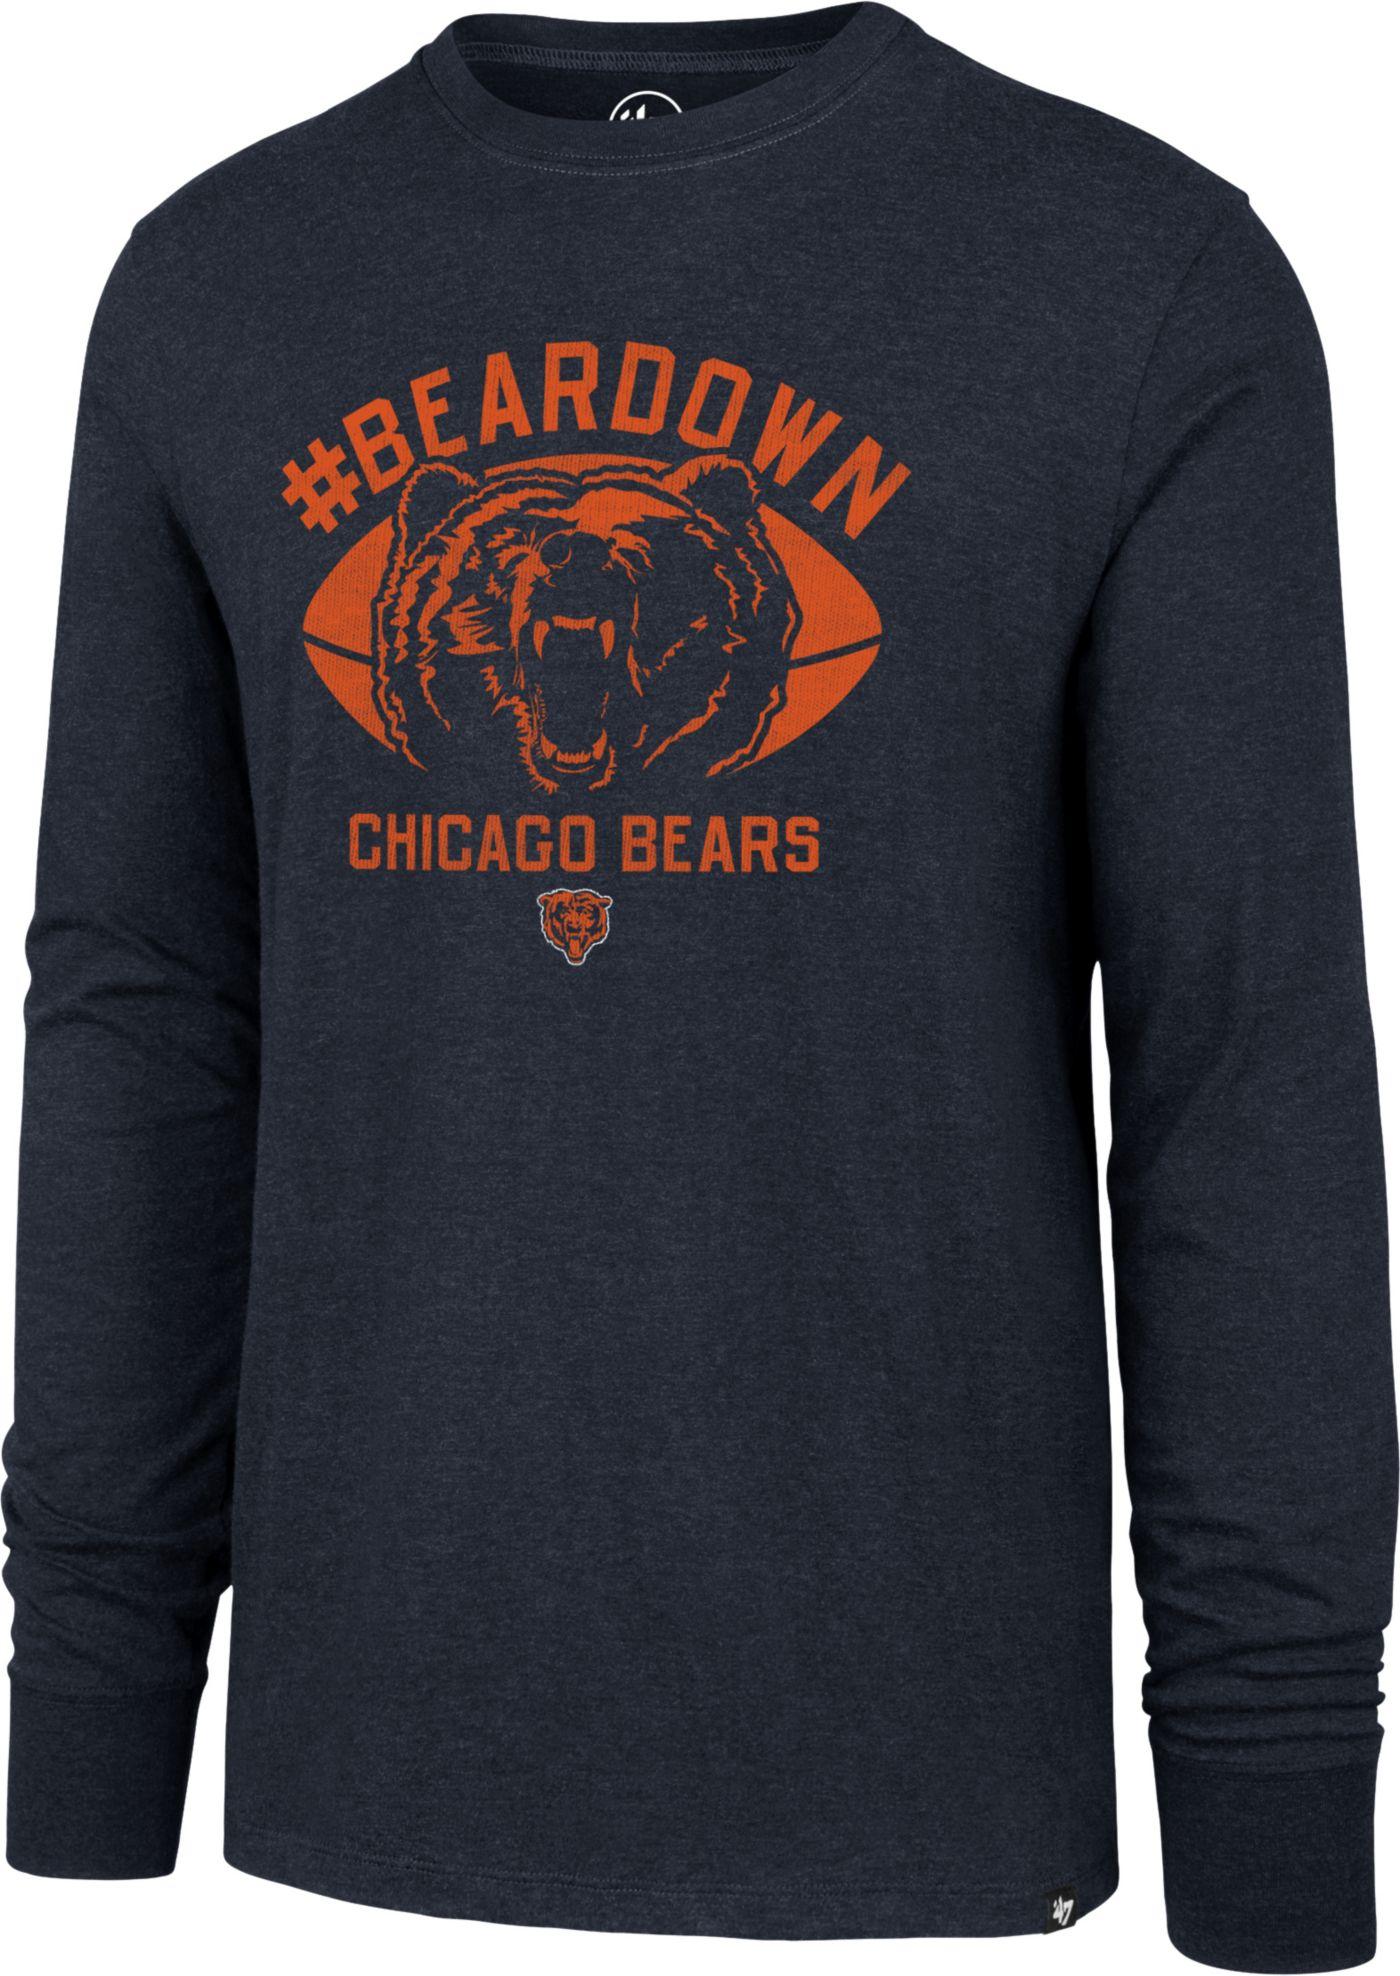 '47 Men's Chicago Bears Beardown Club Navy Long Sleeve Shirt